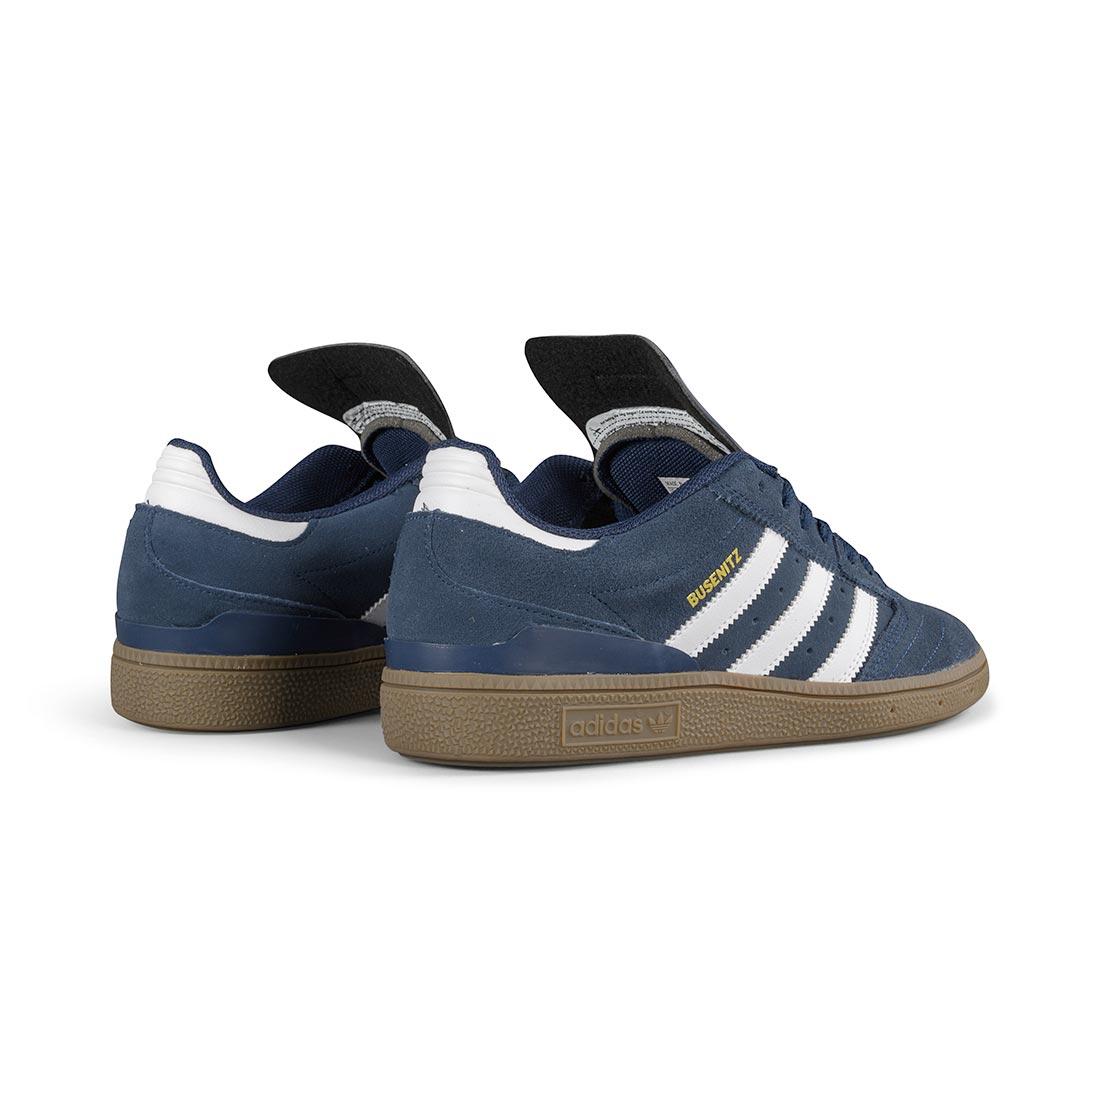 Adidas Busenitz Shoes - Collegiate Navy